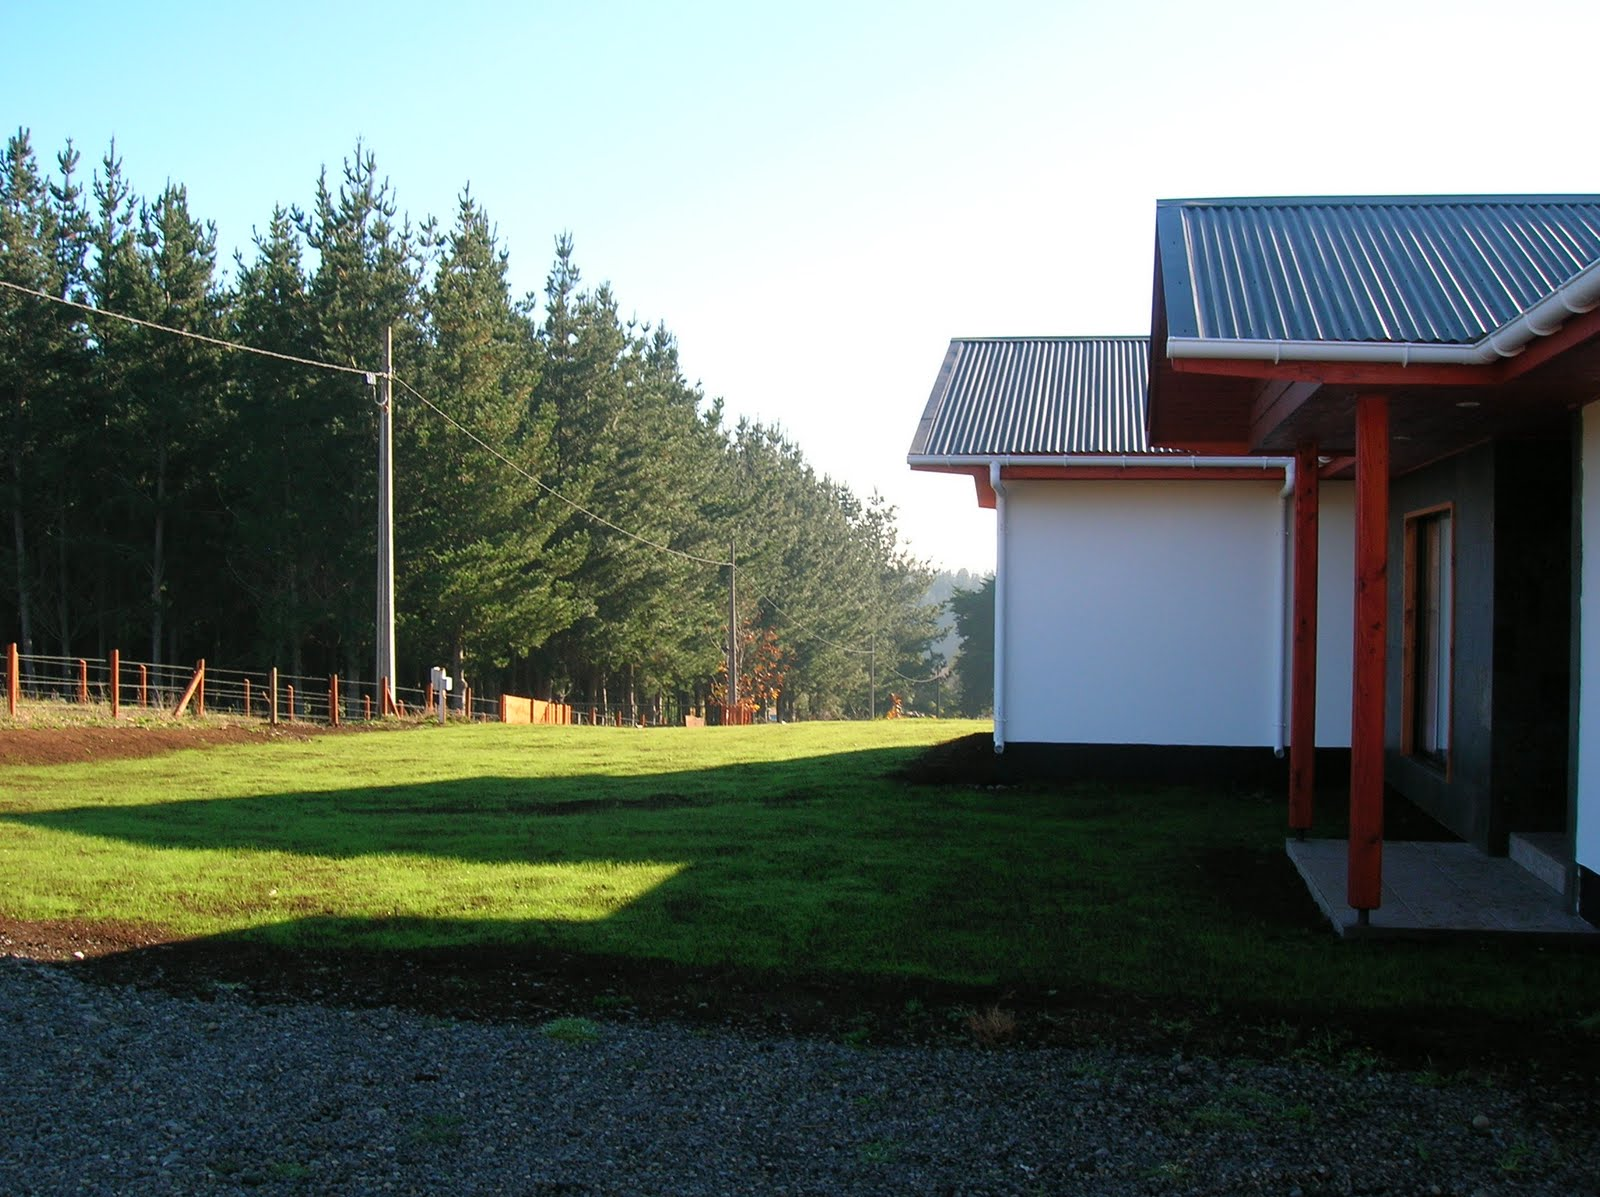 Constructora loma linda casa con ventanas de termopanel for Constructora casa